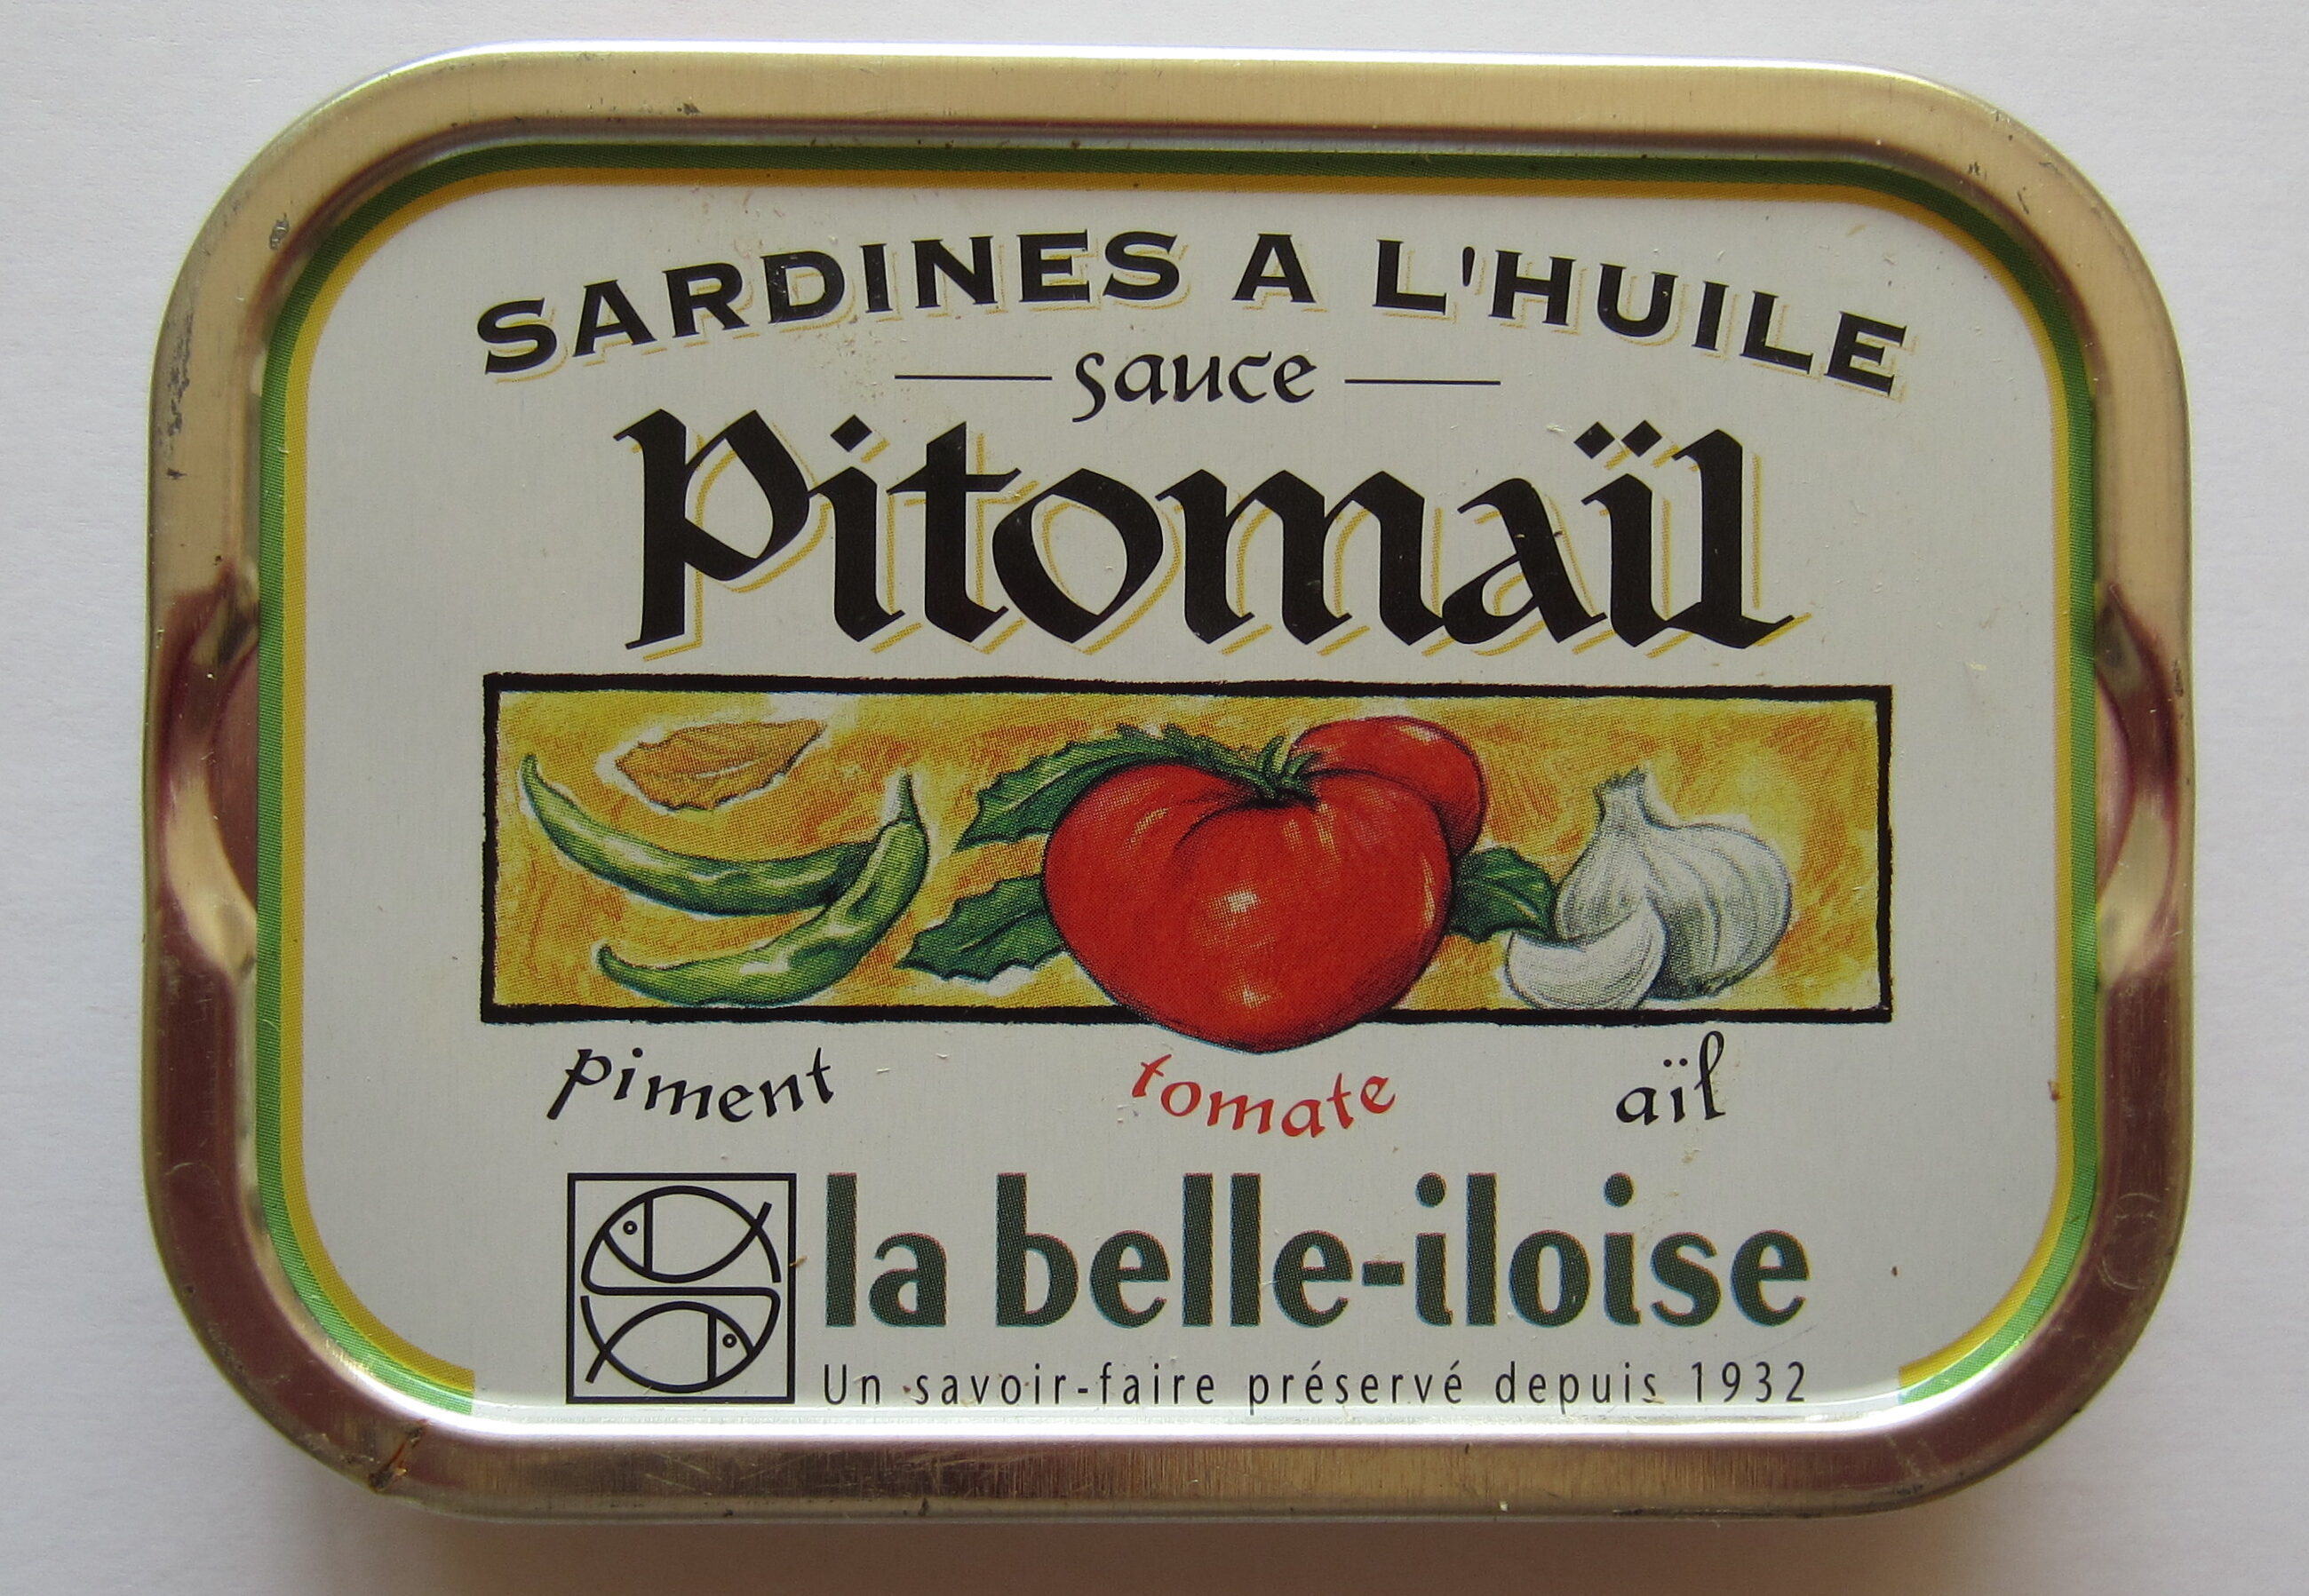 Sardines à l'huile, sauce Pitomaïl - Product - fr